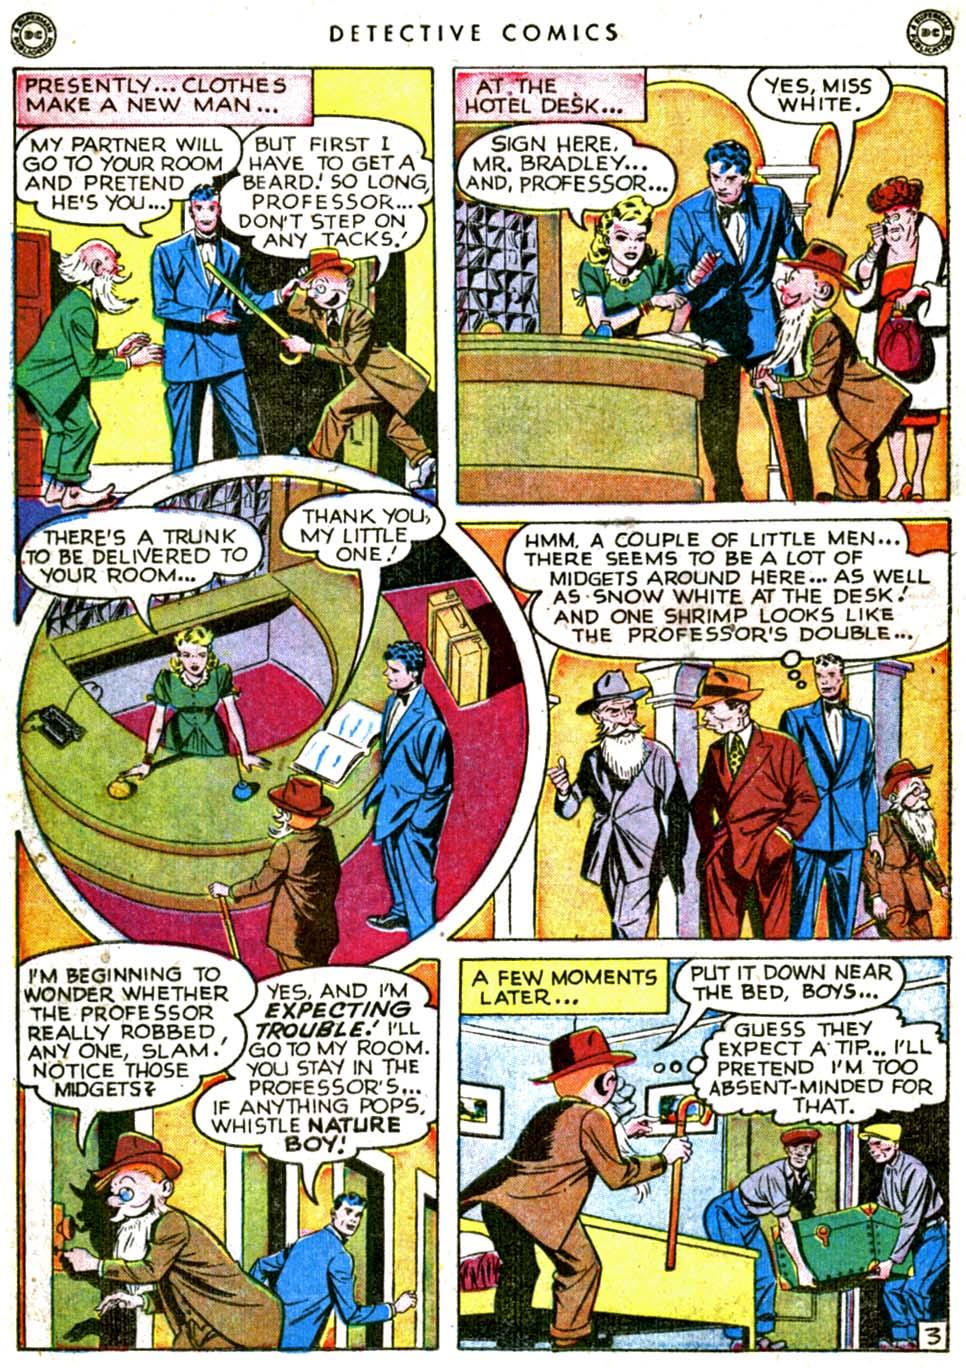 Read online Detective Comics (1937) comic -  Issue #144 - 26